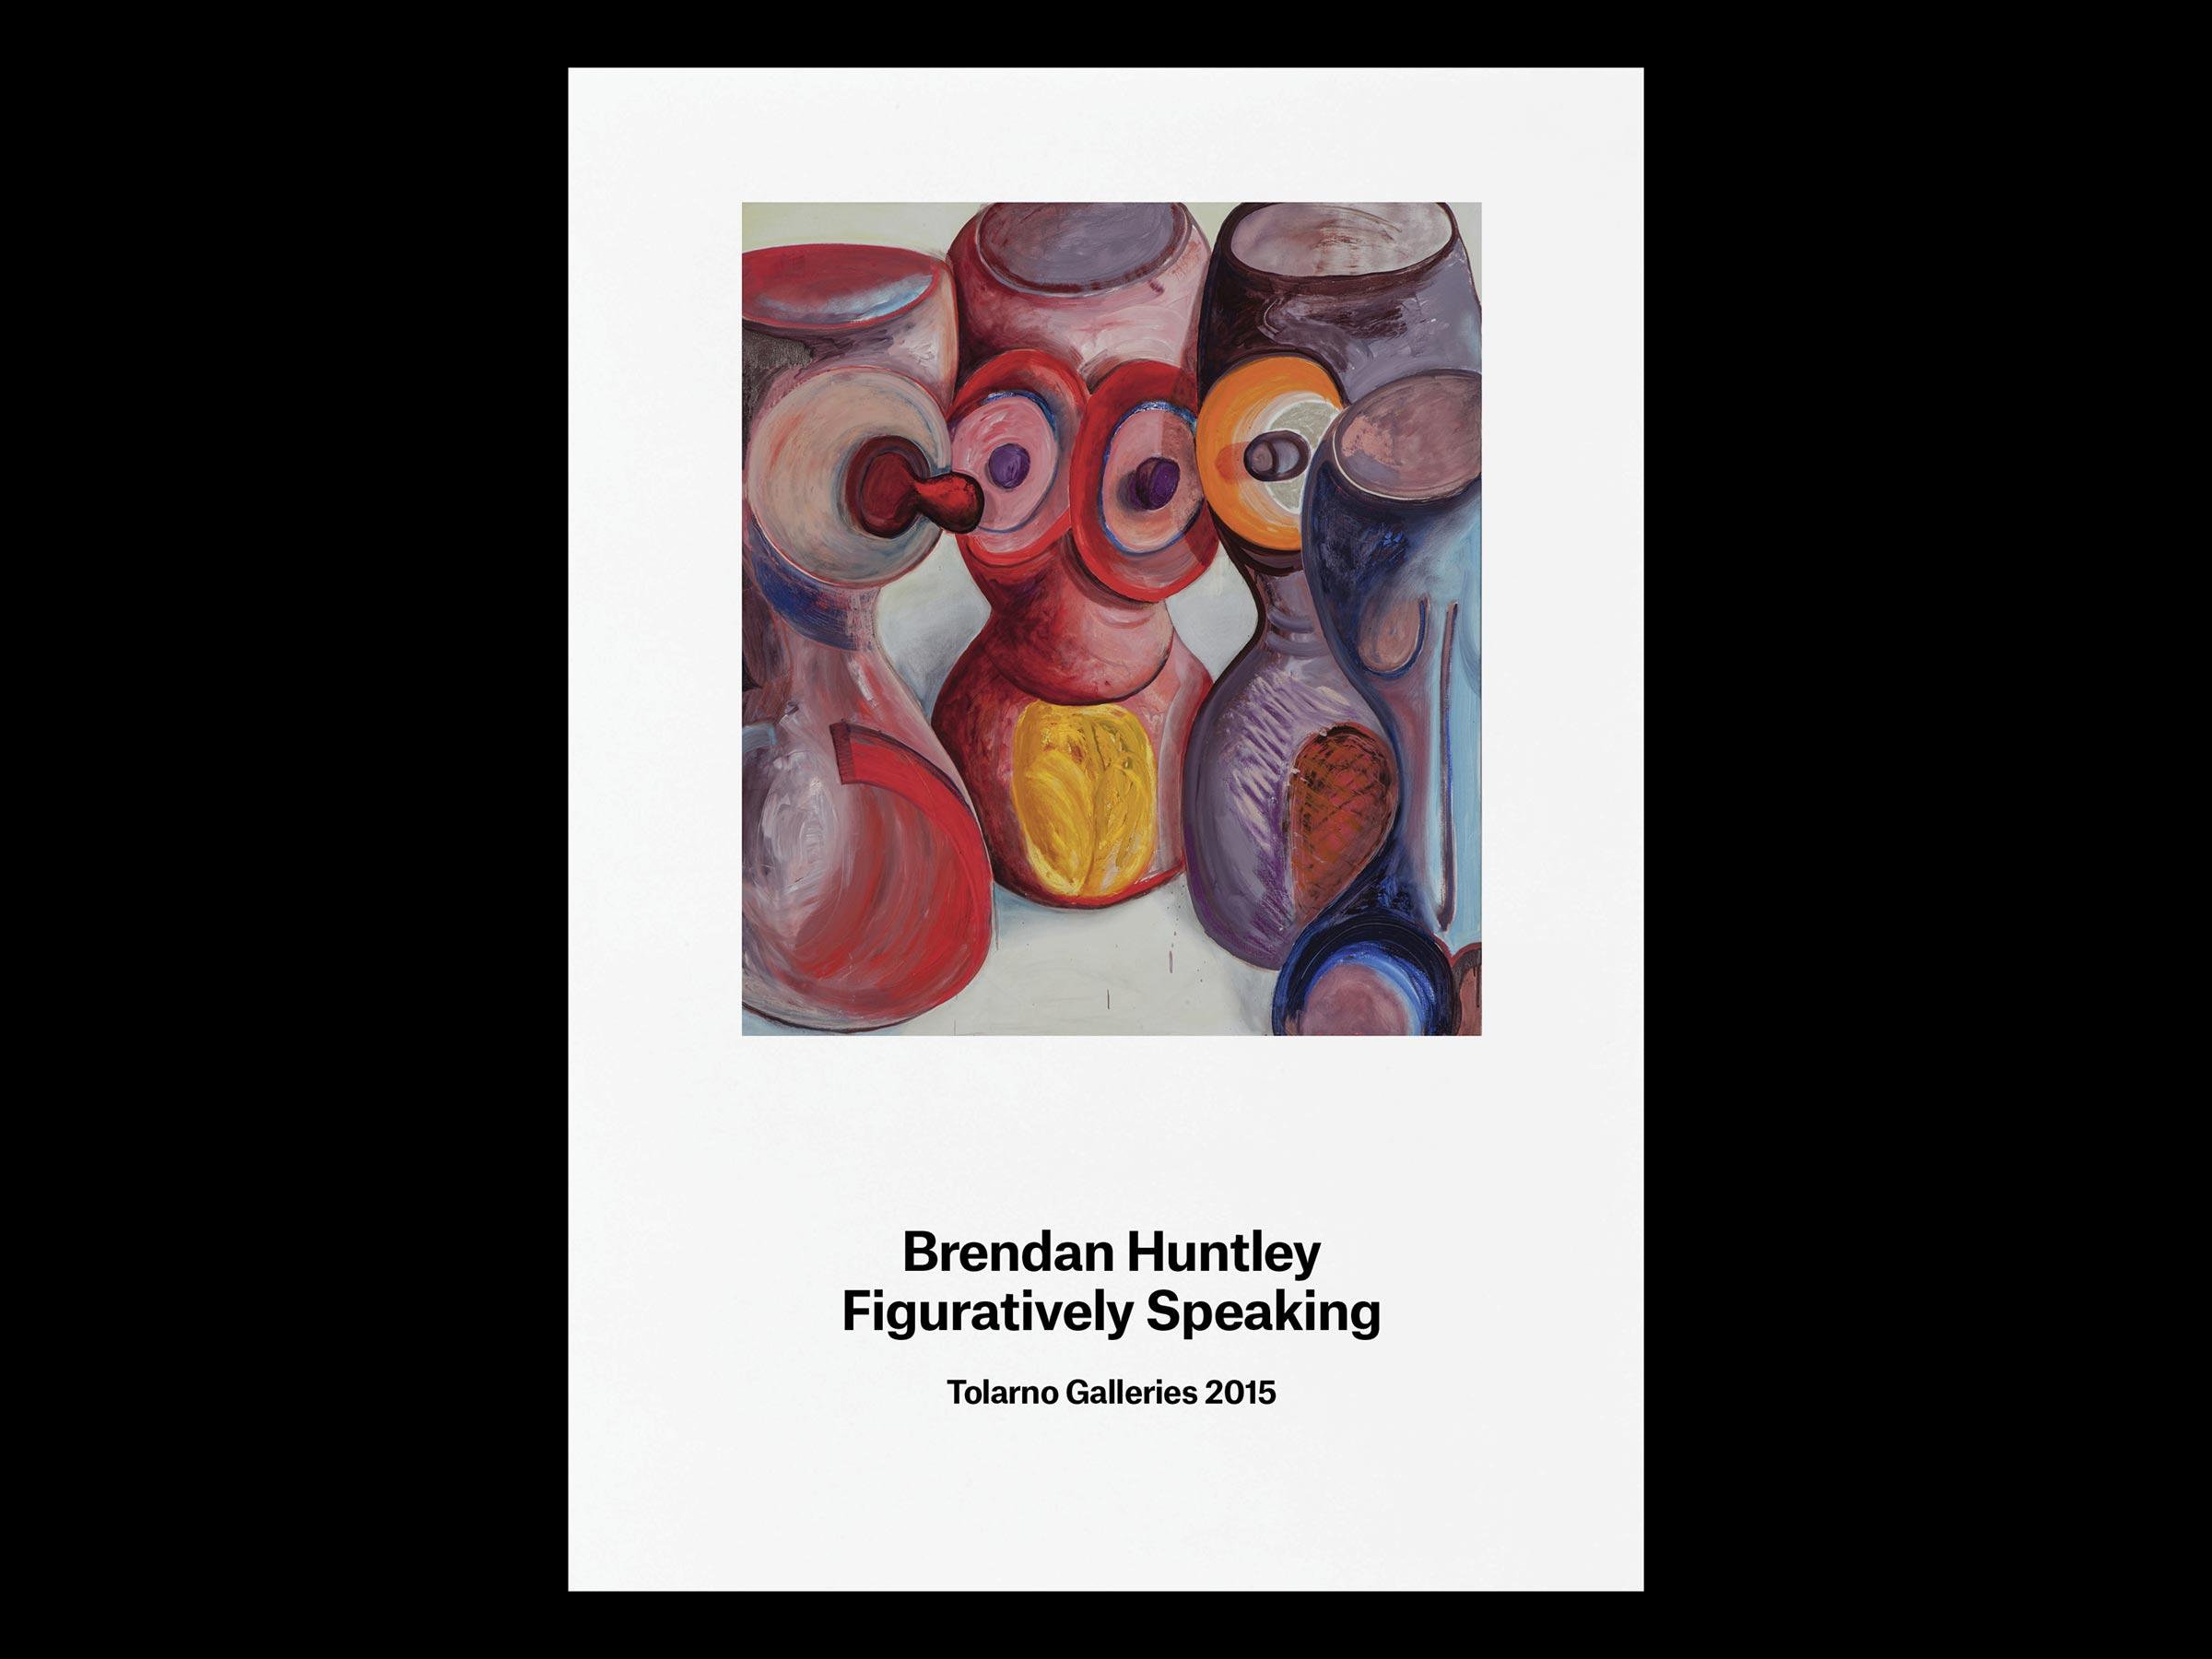 Brendan Huntley, Figuratively Speaking